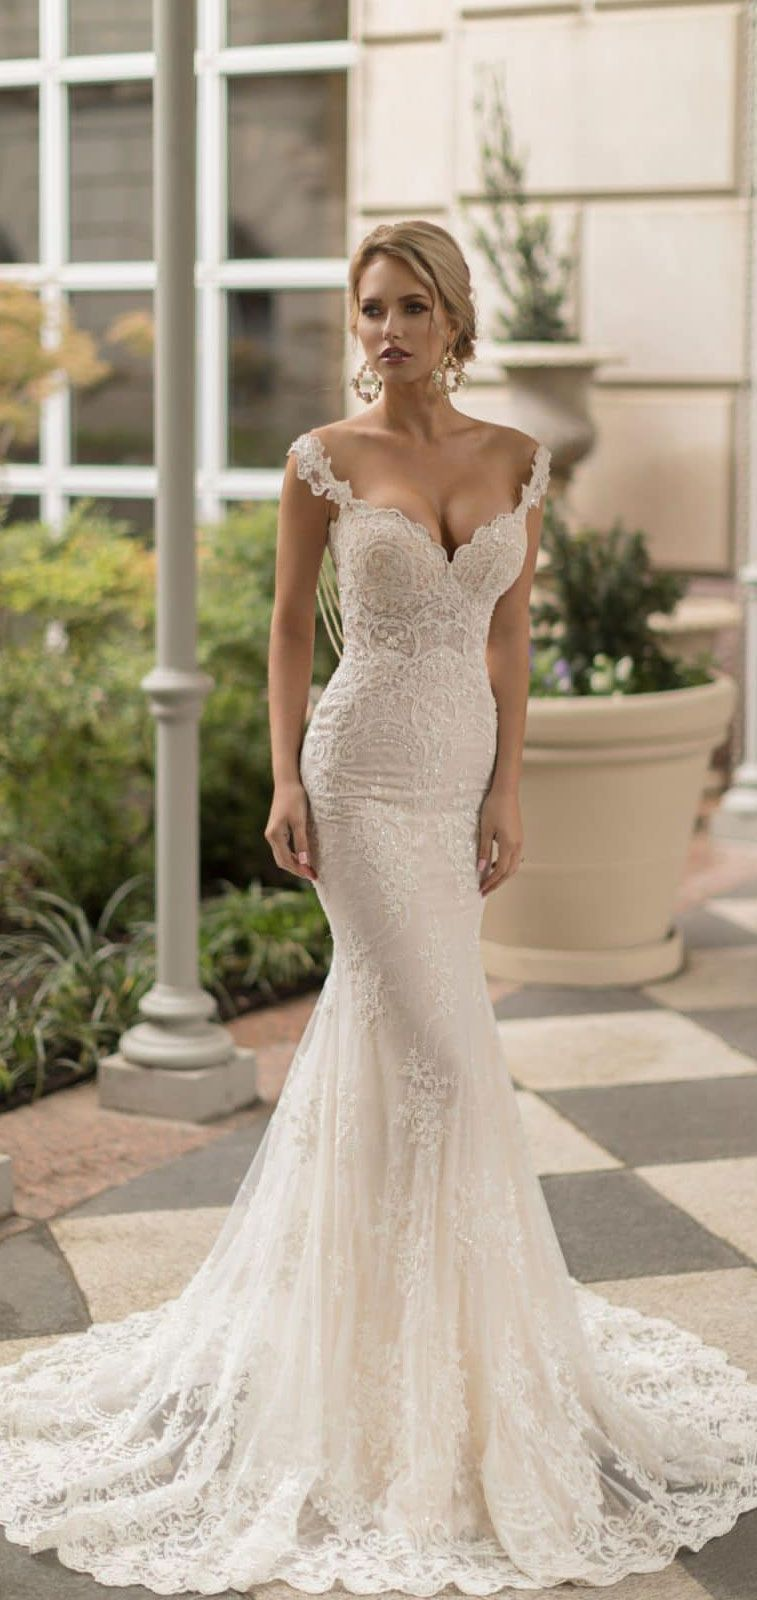 29 The Best Mermaid Wedding Dresses Dress Mermaiddress Weddingdress Weddinggowns